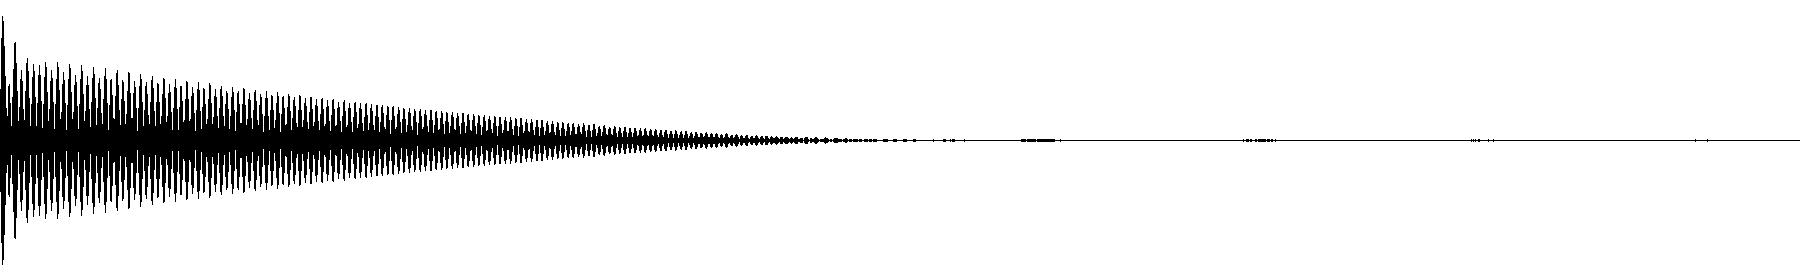 perc15